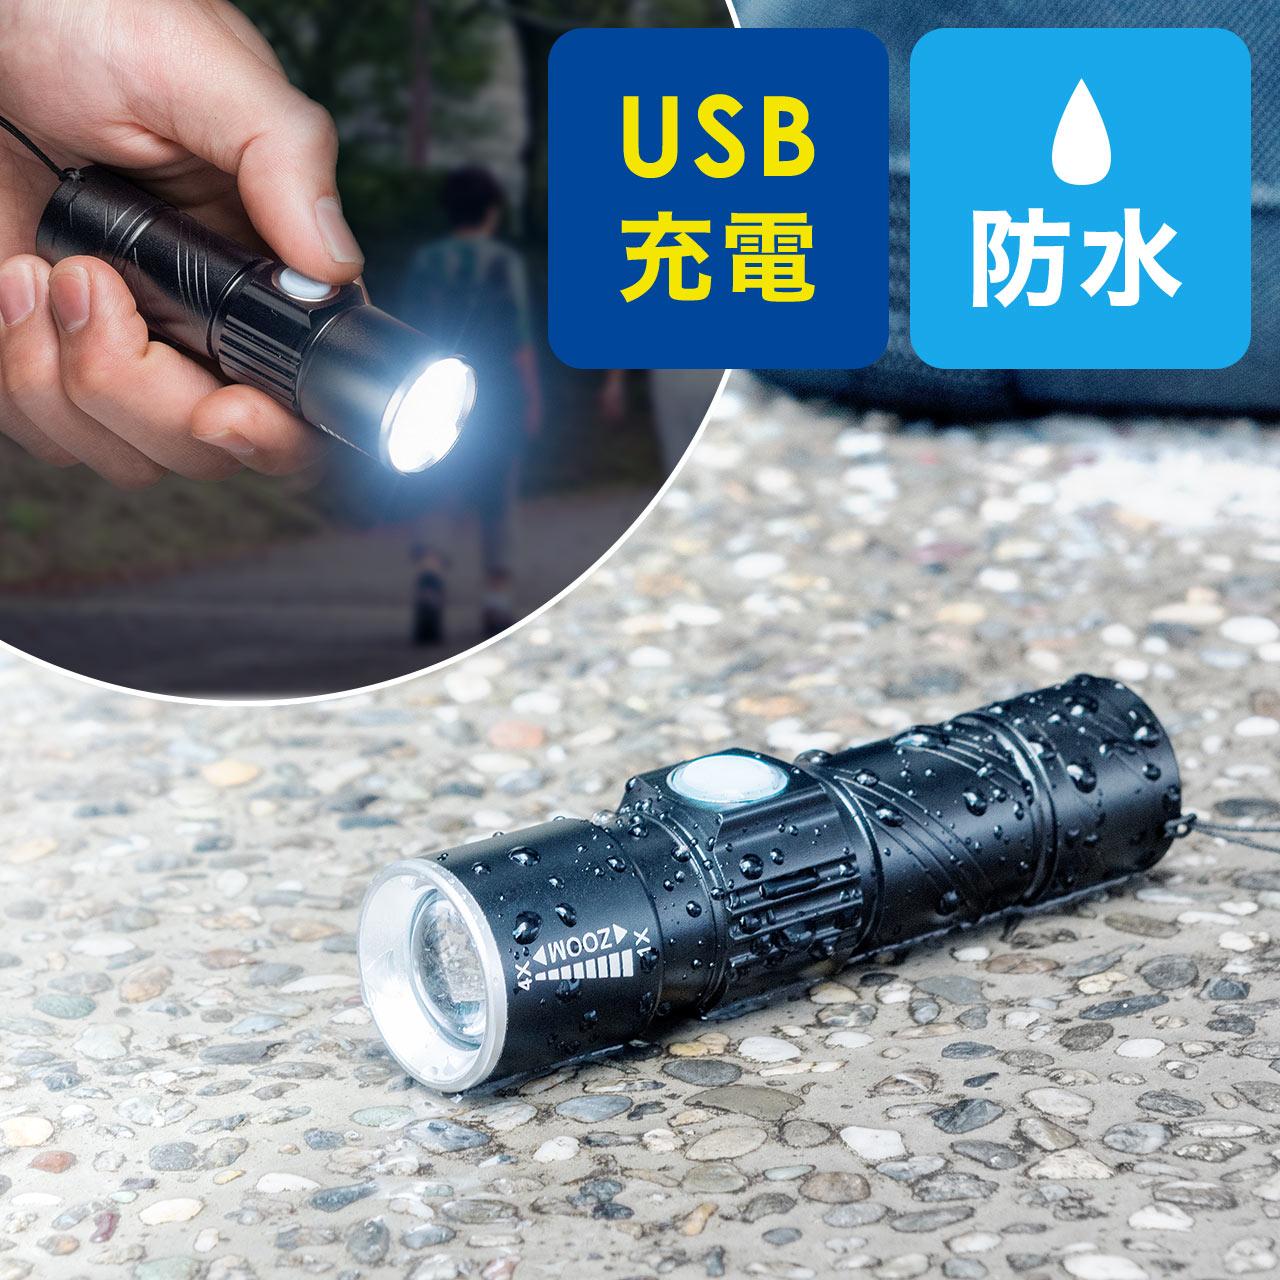 LED懐中電灯 USB充電式 防水 IPX4 最大120ルーメン 小型 ハンディライト LEDライト 強力 防災 充電式 [800-LED017]【サンワダイレクト限定品】